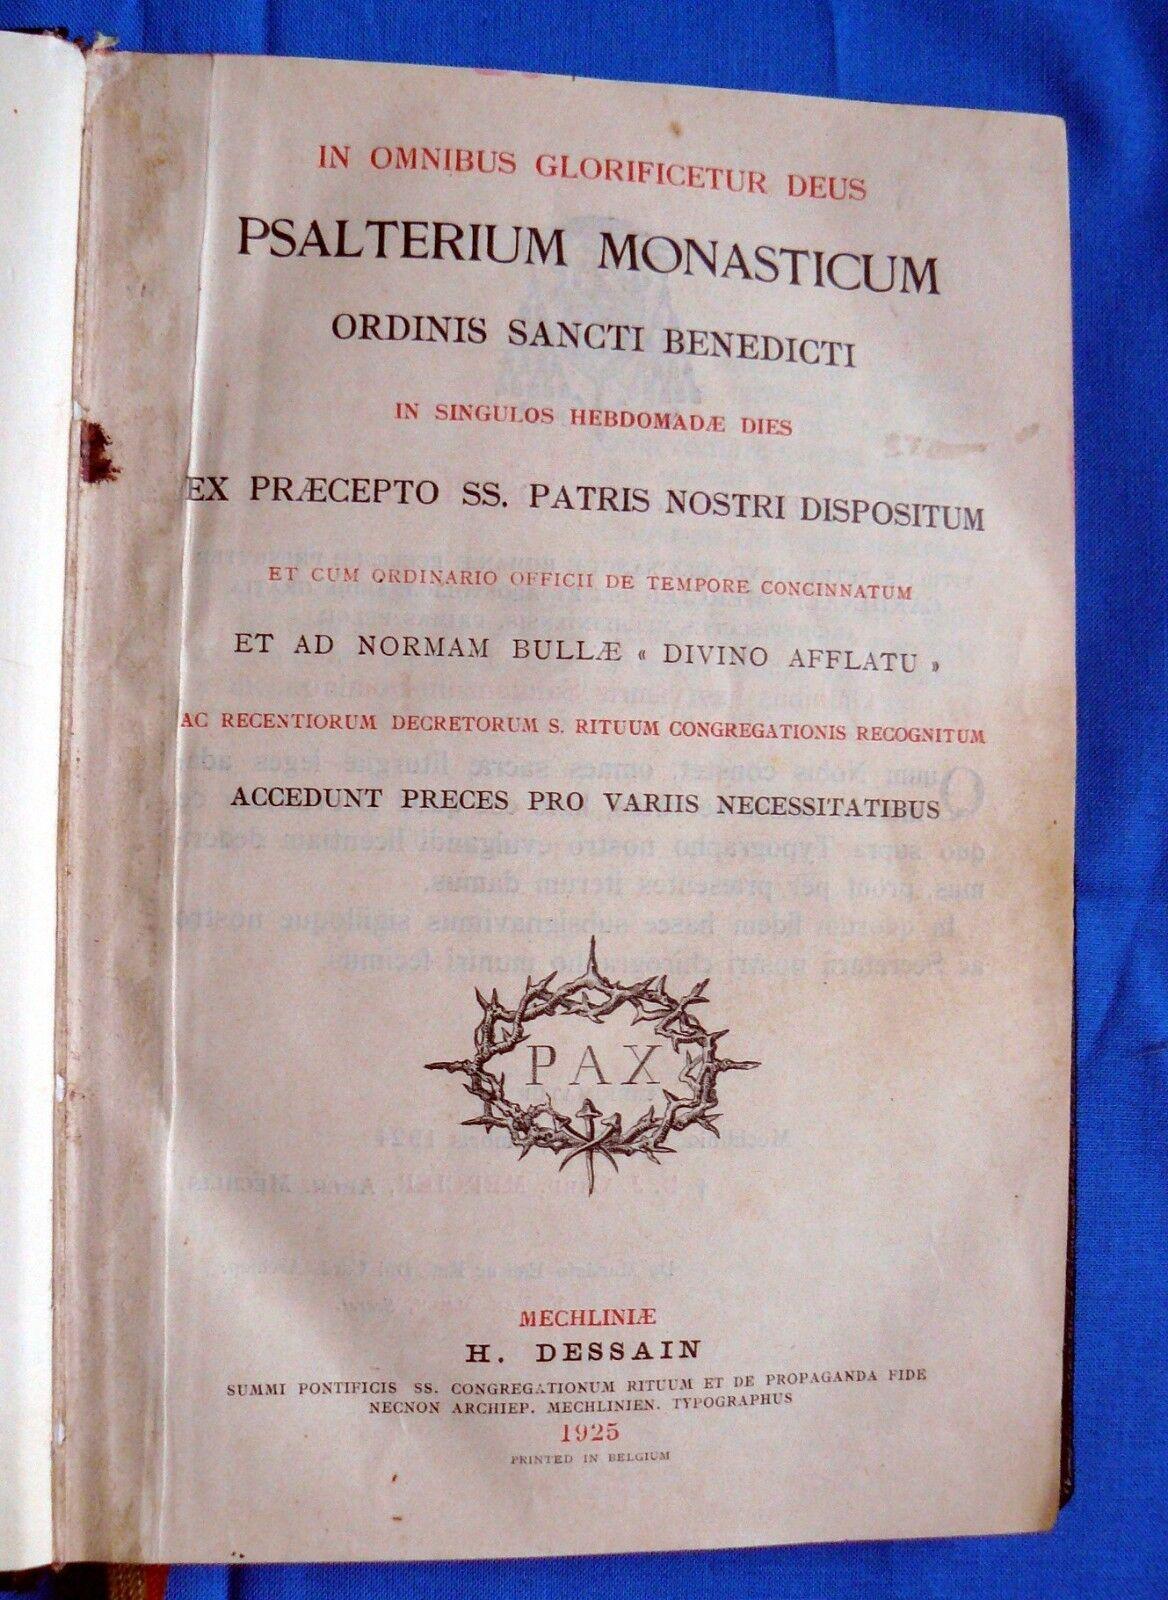 PSALTERIUM MONASTICUM 1925 Liturgy Benediktiner OSB H. Dessain ~HOLY BOOKS~